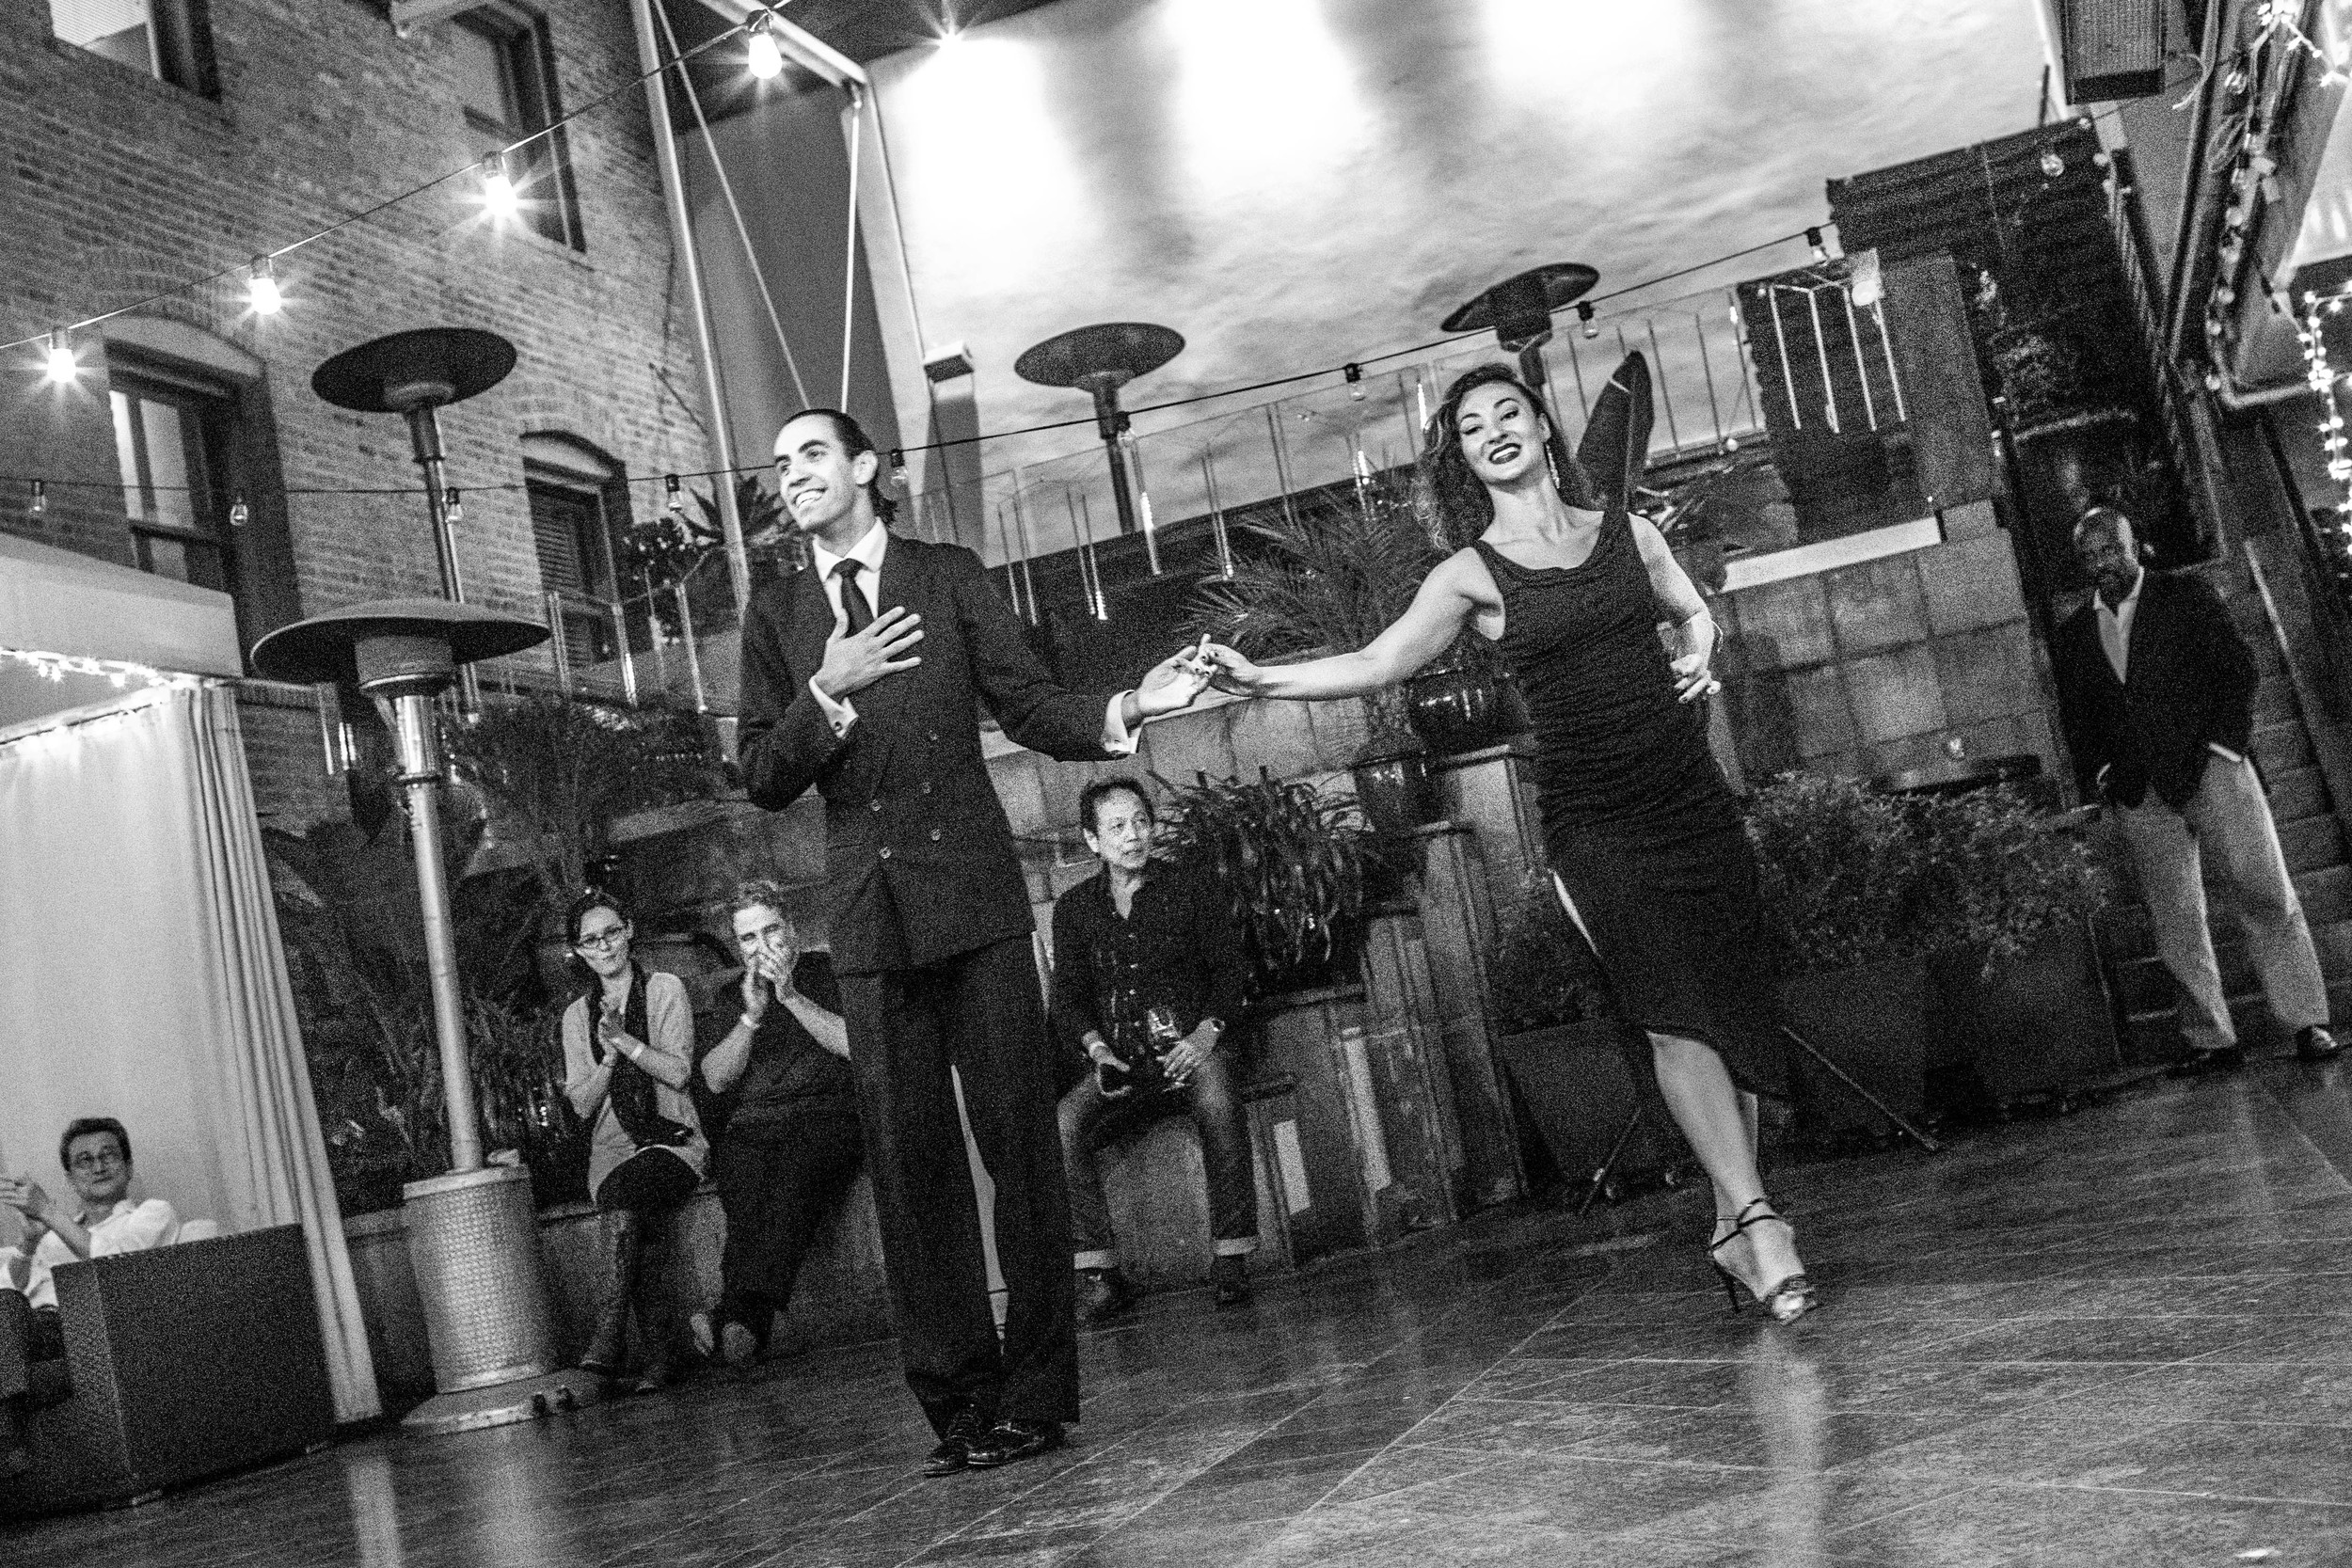 LATA-tango-performance-5821.jpg